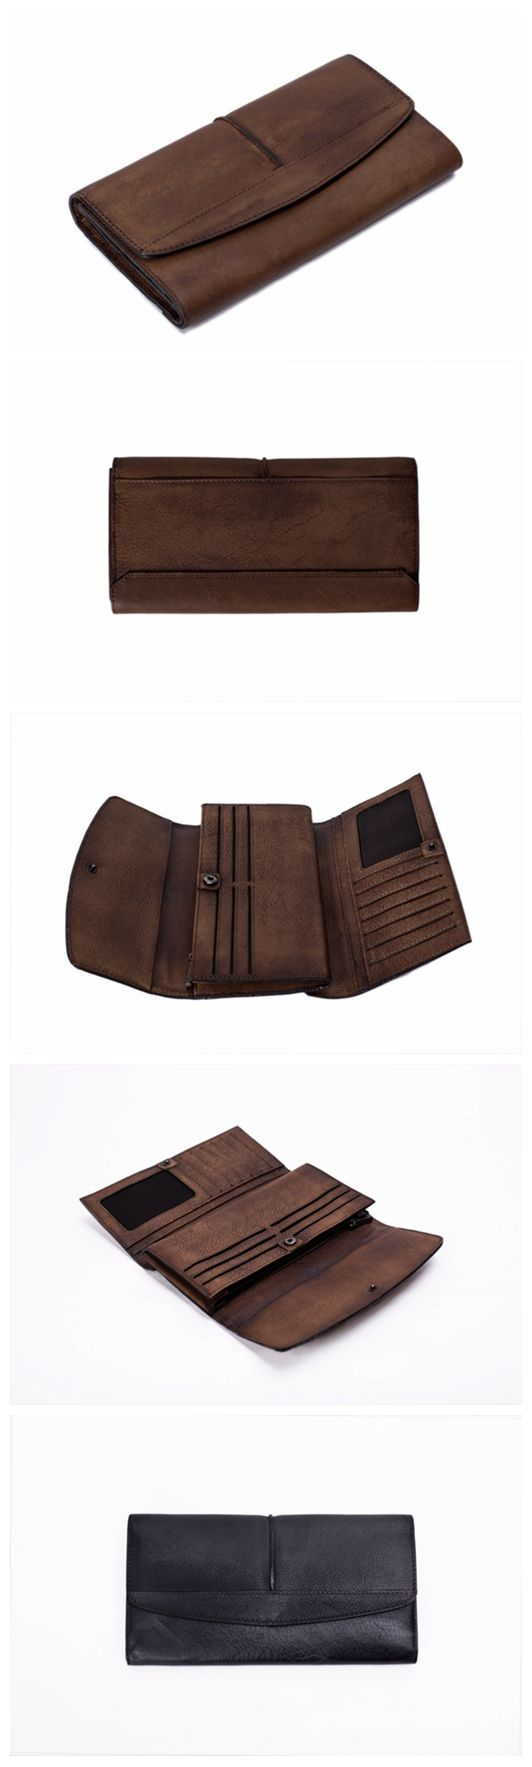 Vintage Style Genuine Natural Leather Wallet, Long Wallet, Men's Wallet 9056